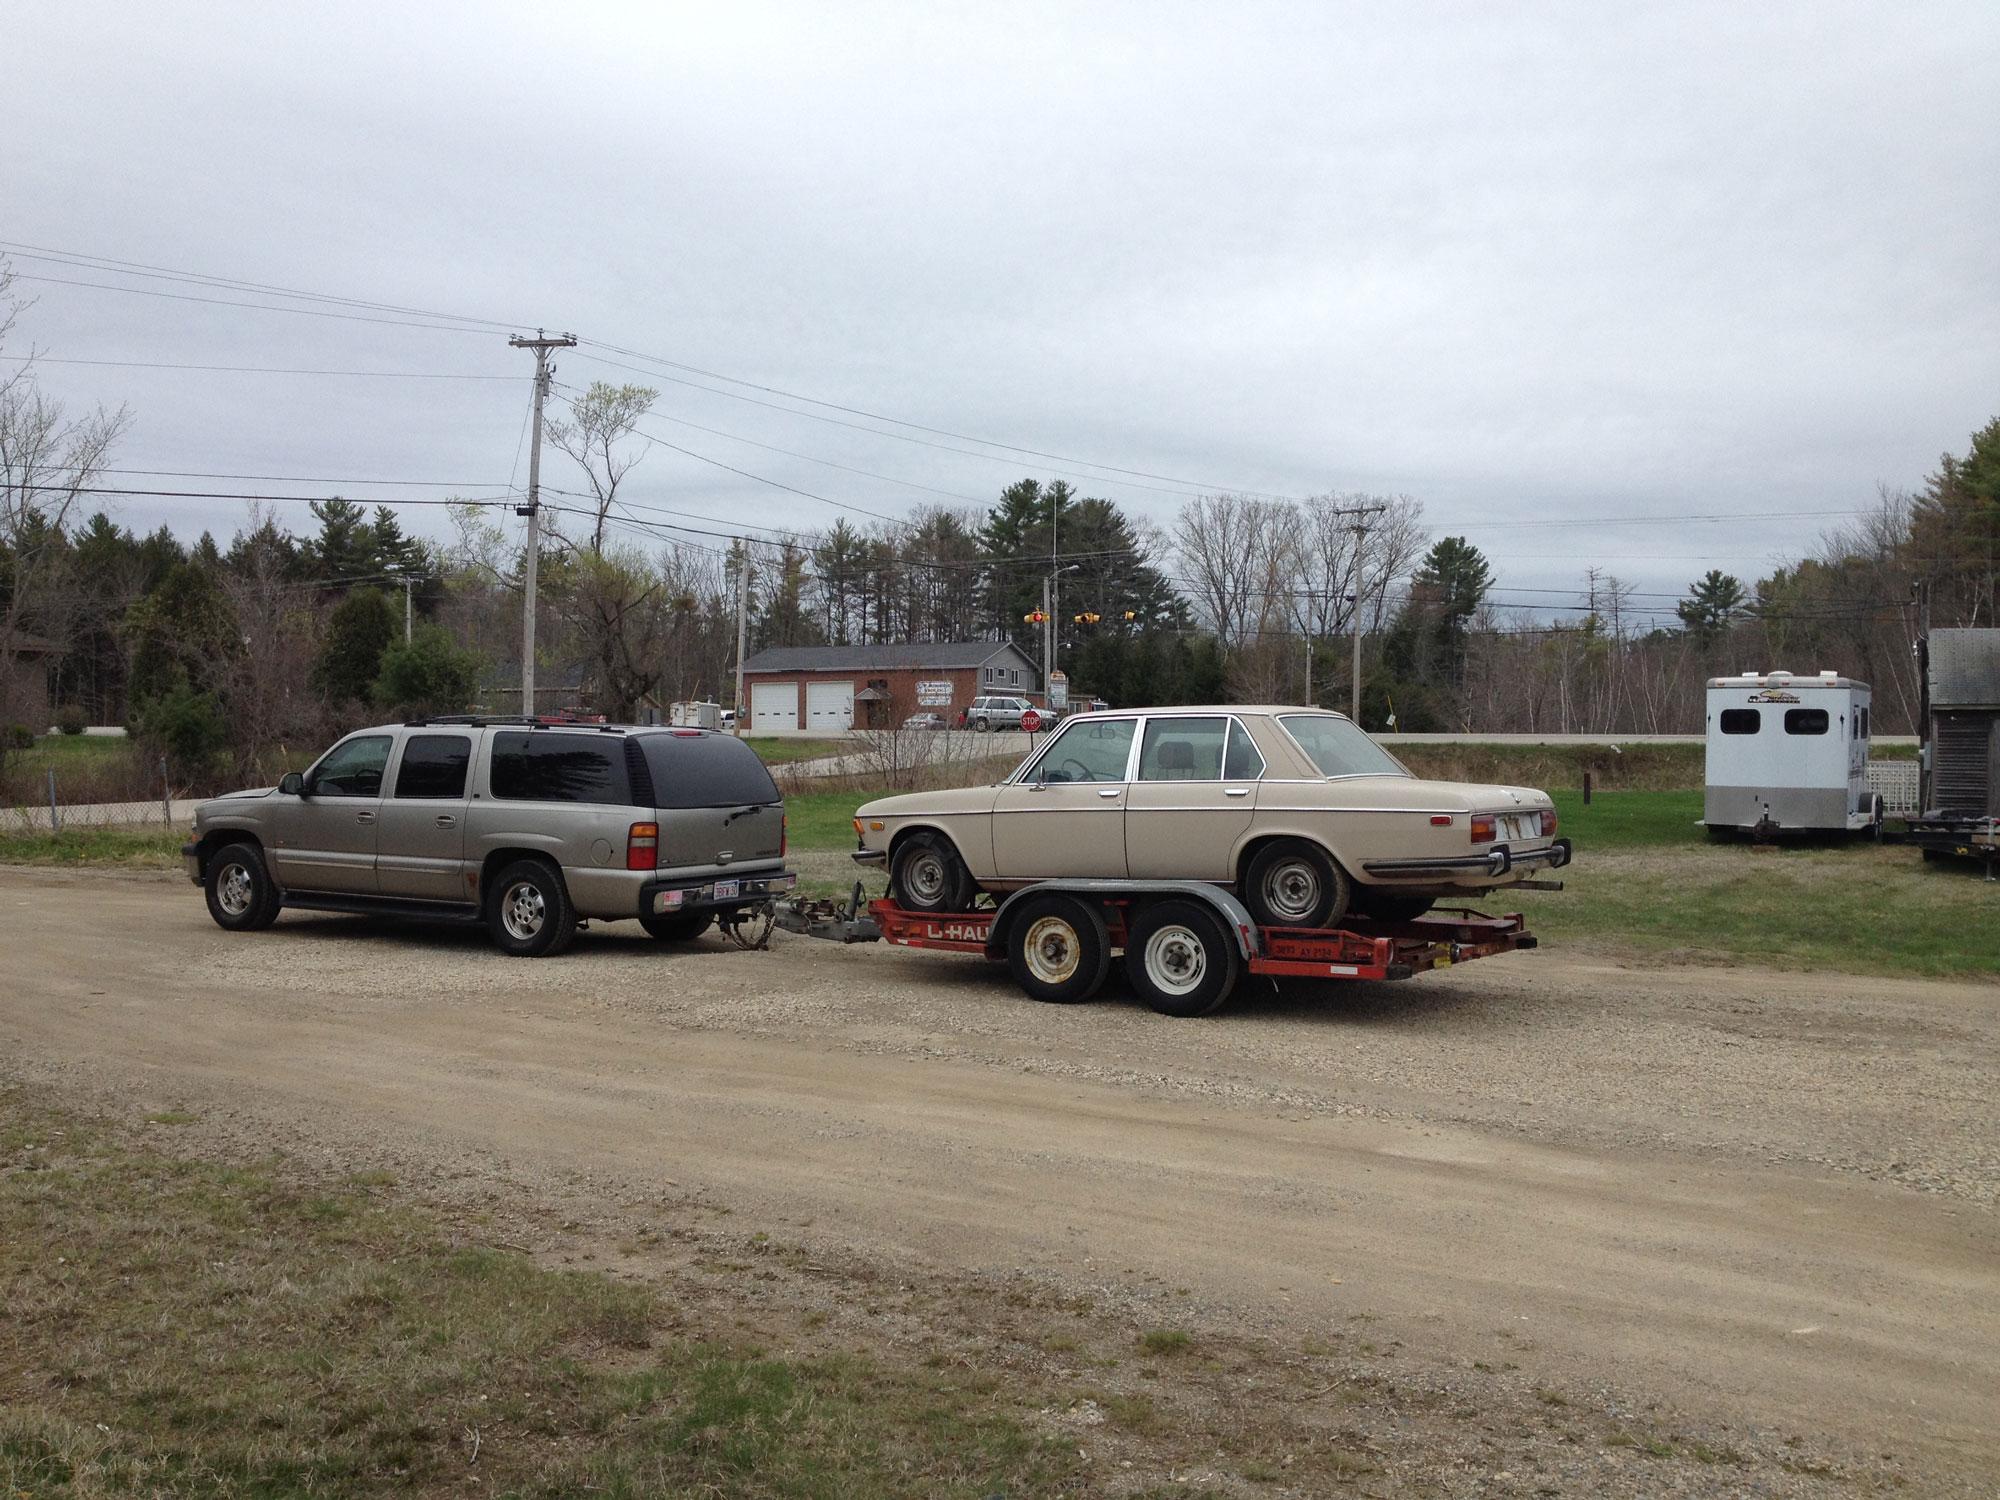 The 'Burb hauling home the Bav.